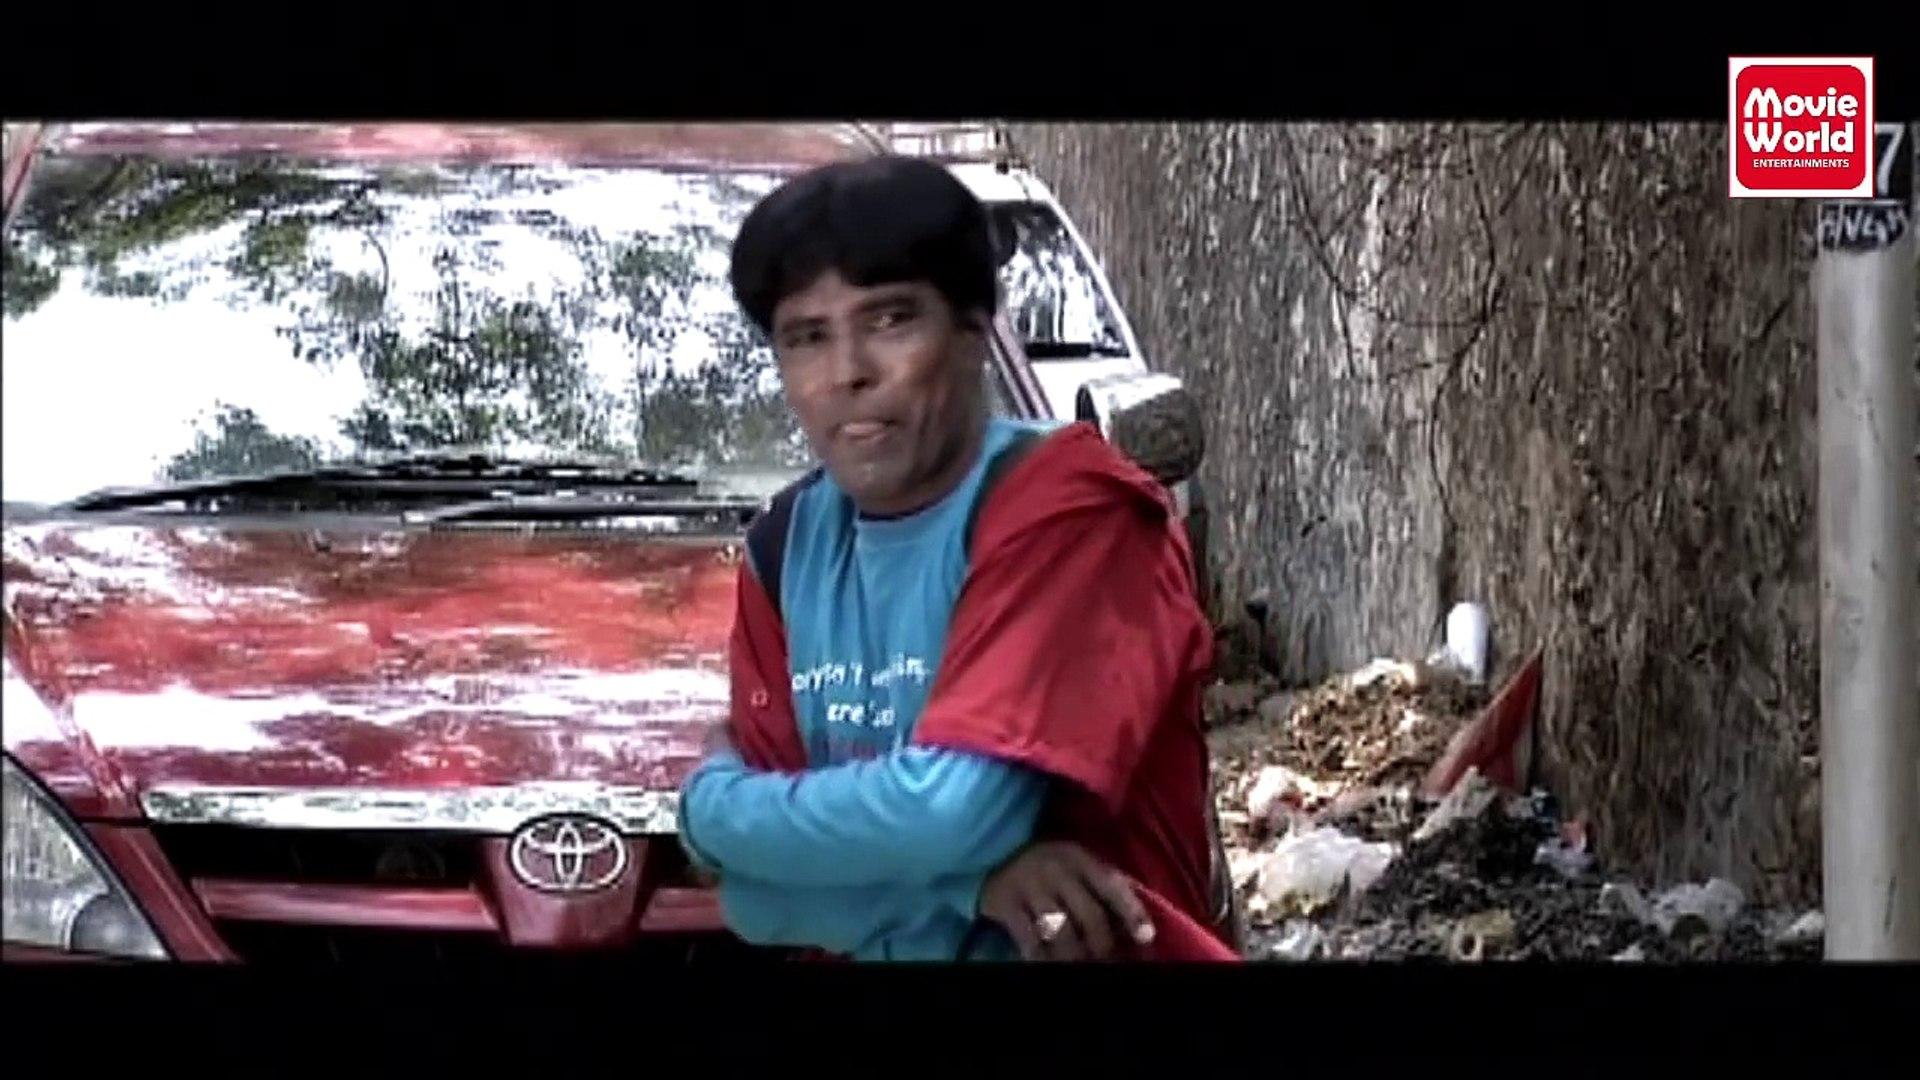 Tamil Movies 2014 Full Movie - Chuda Chuda - Tamil Full Movie [Full HD]